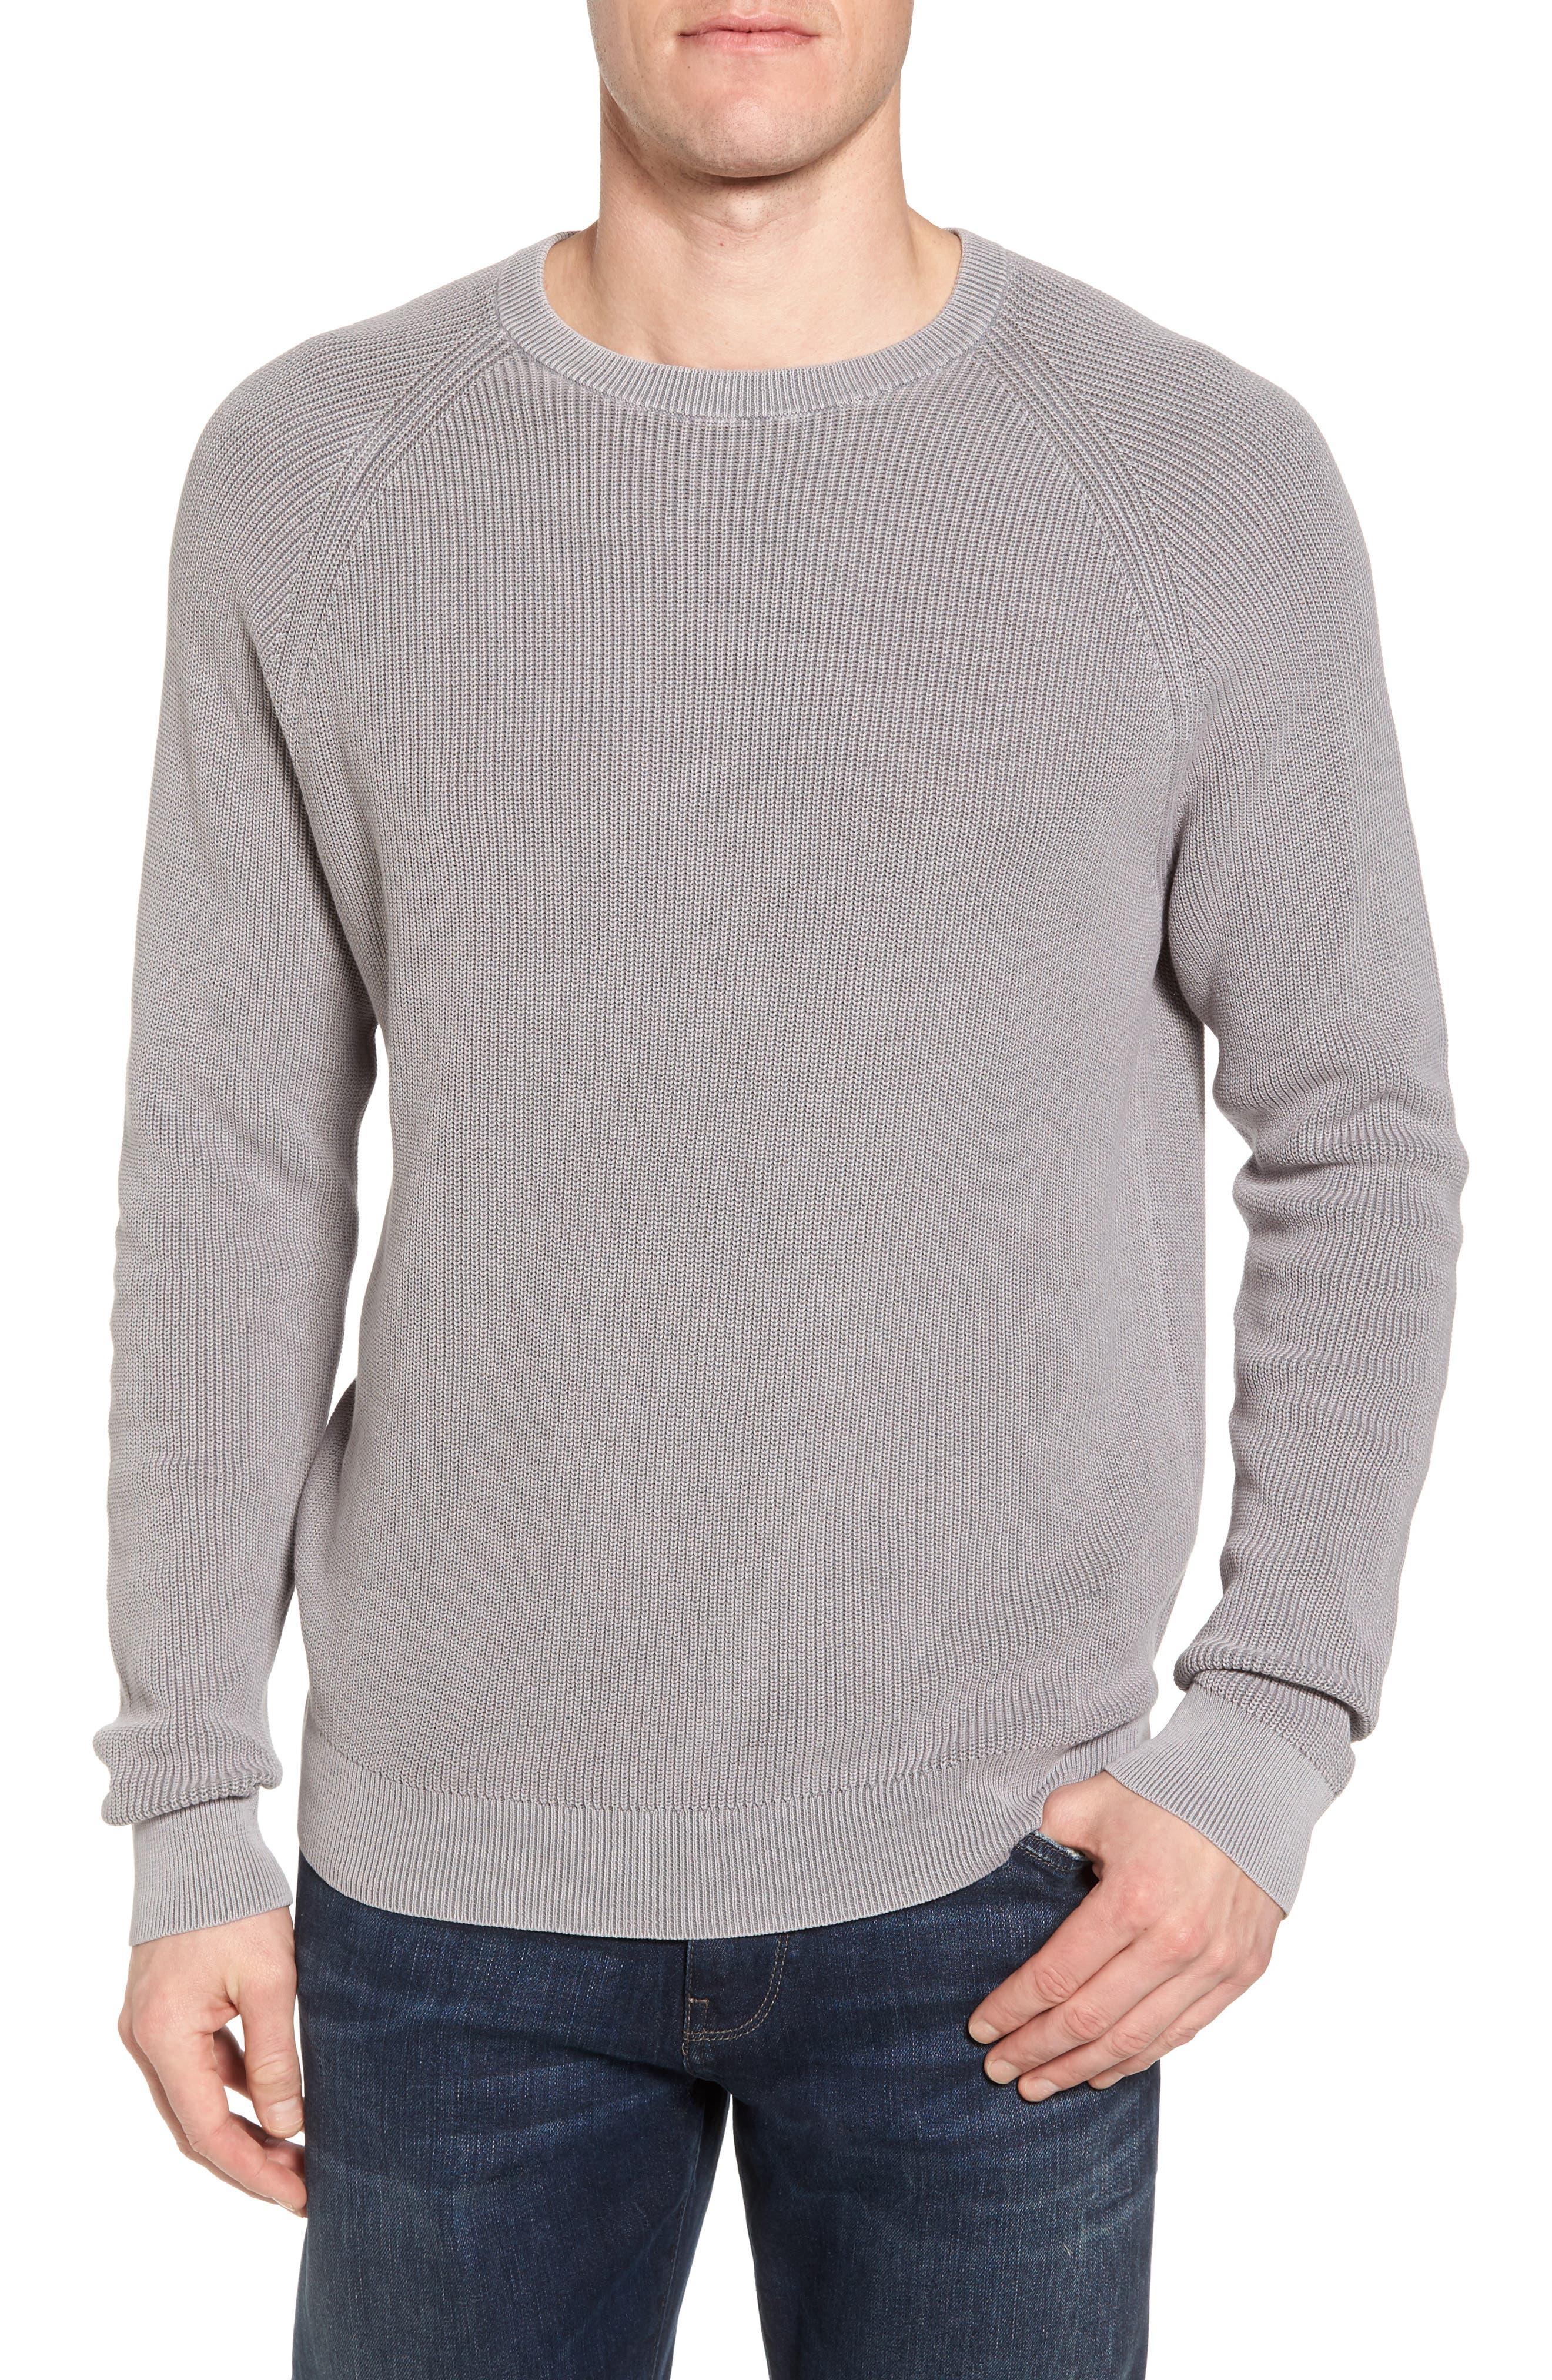 Nordstrom Men's Shop Ribbed Sweater